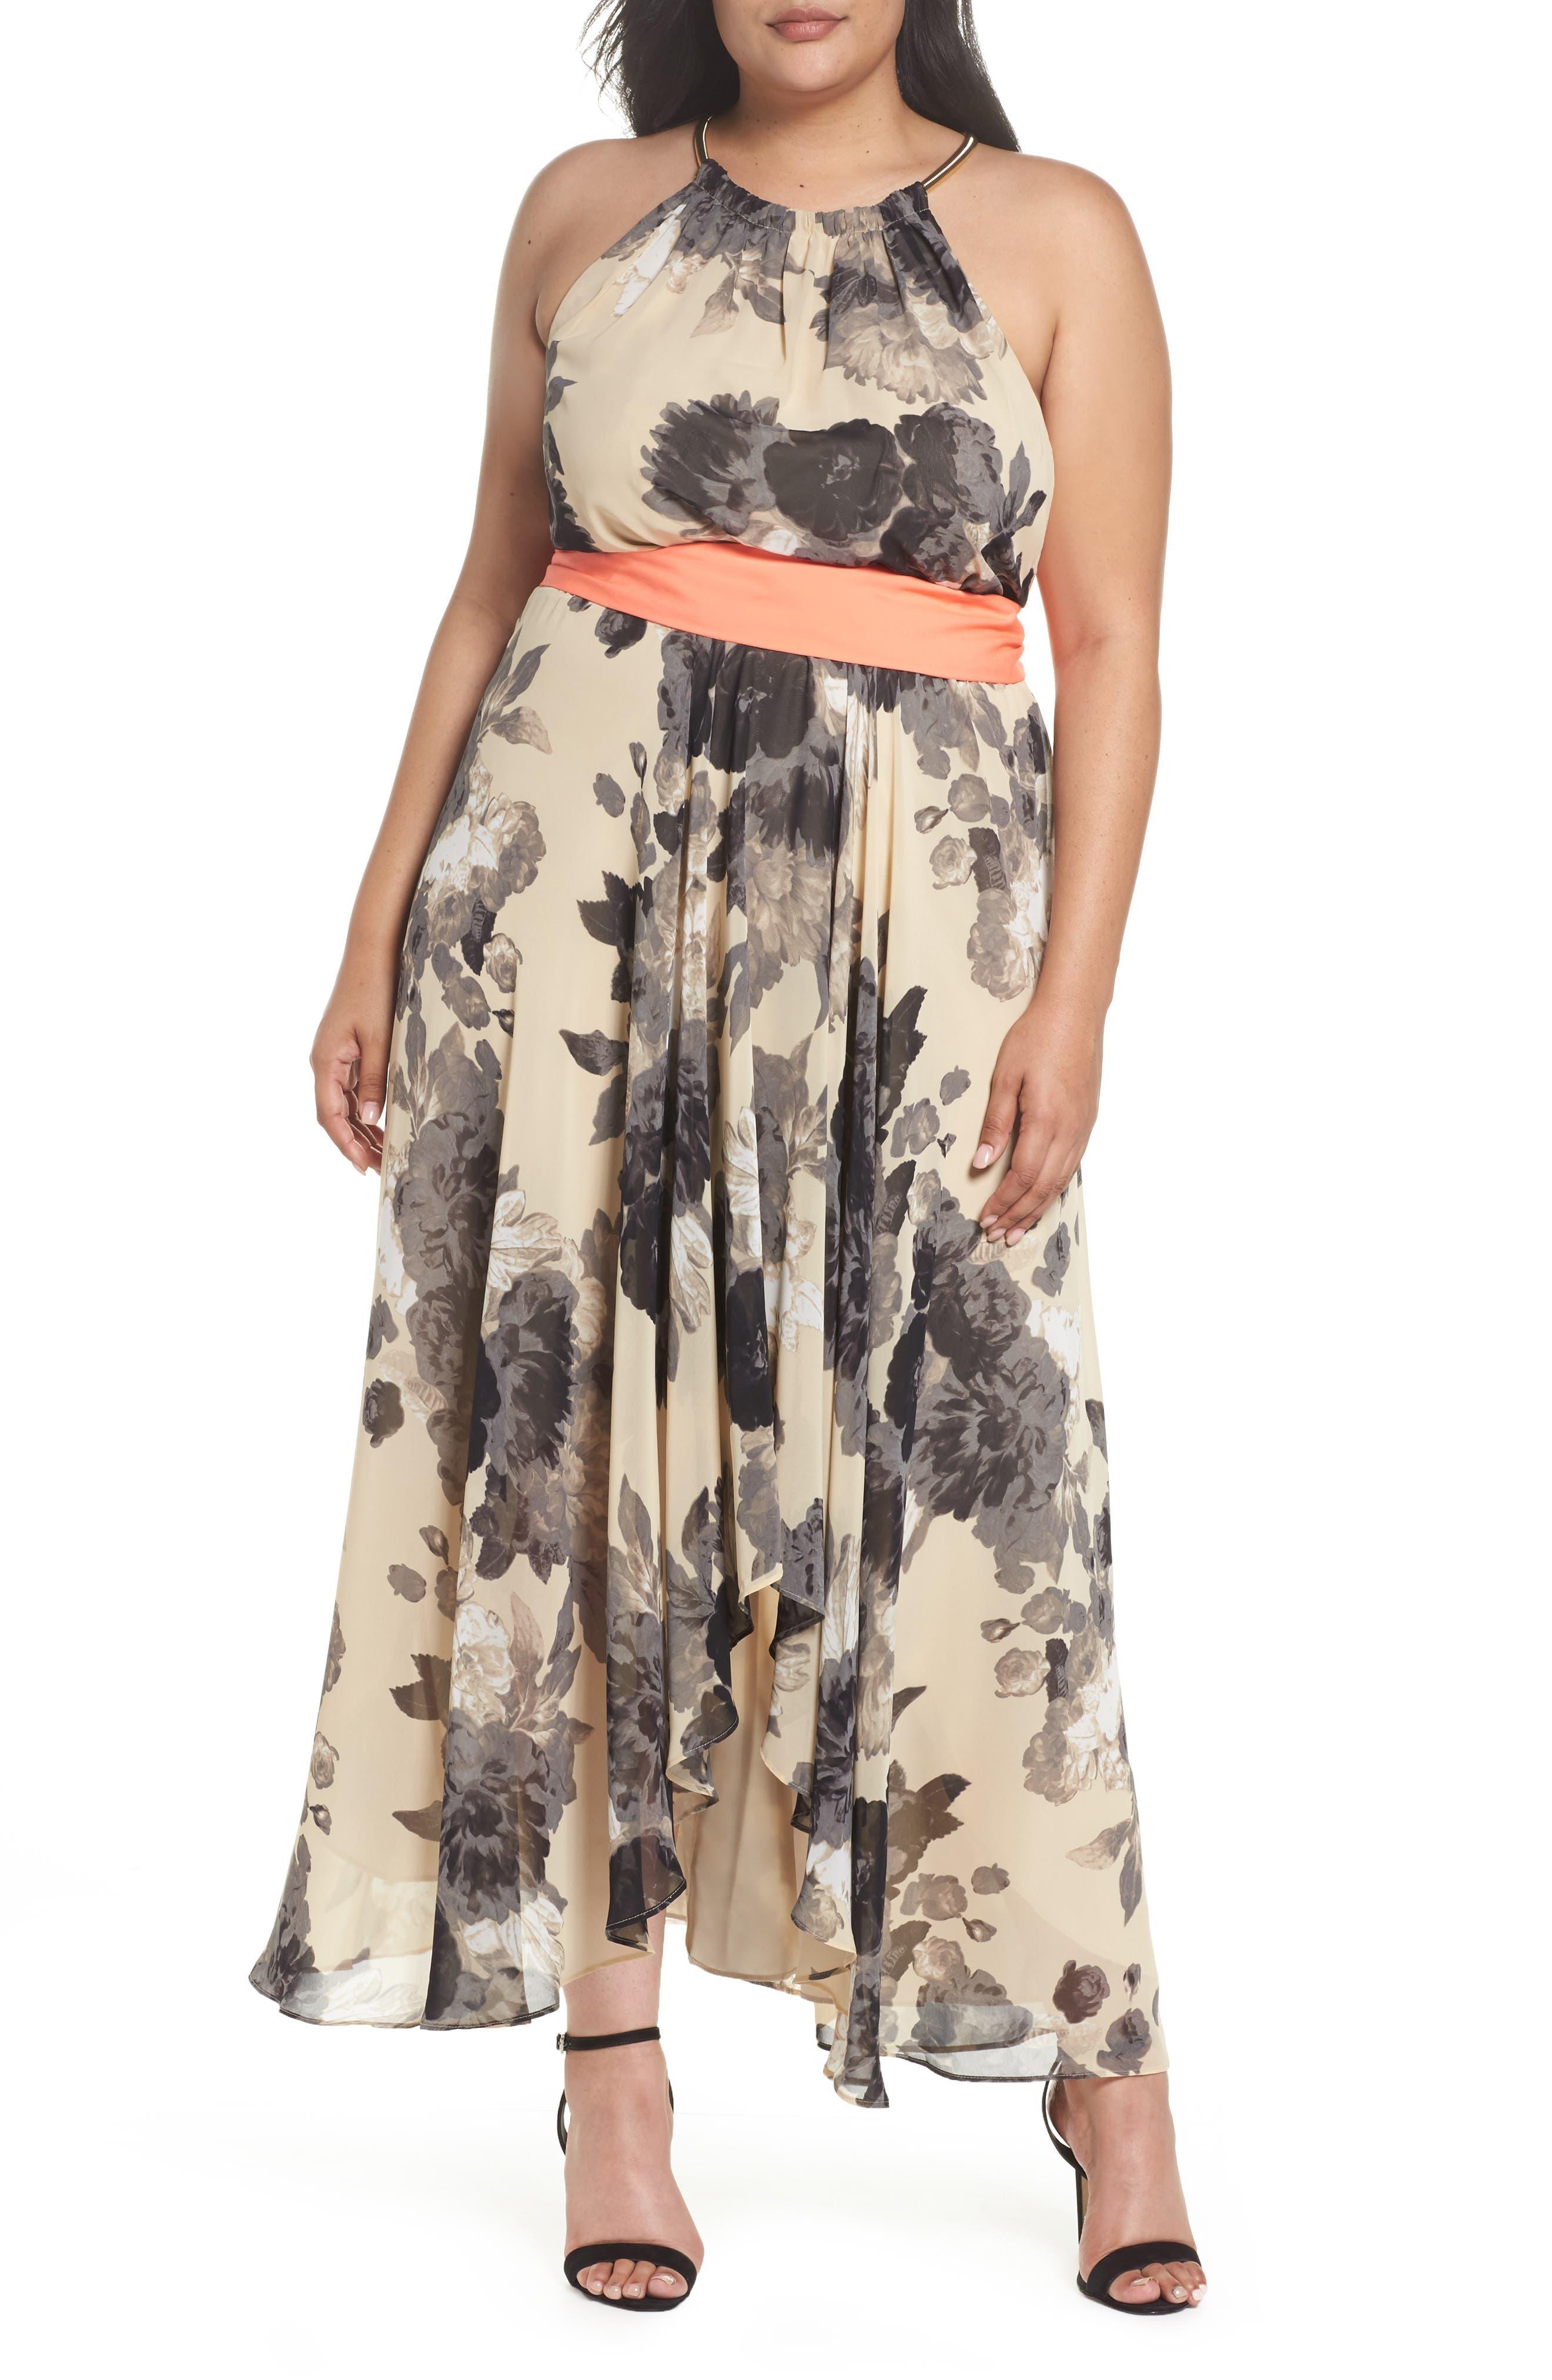 Plus Size Eliza J Halter Floral Print Chiffon High/low Dress, Beige